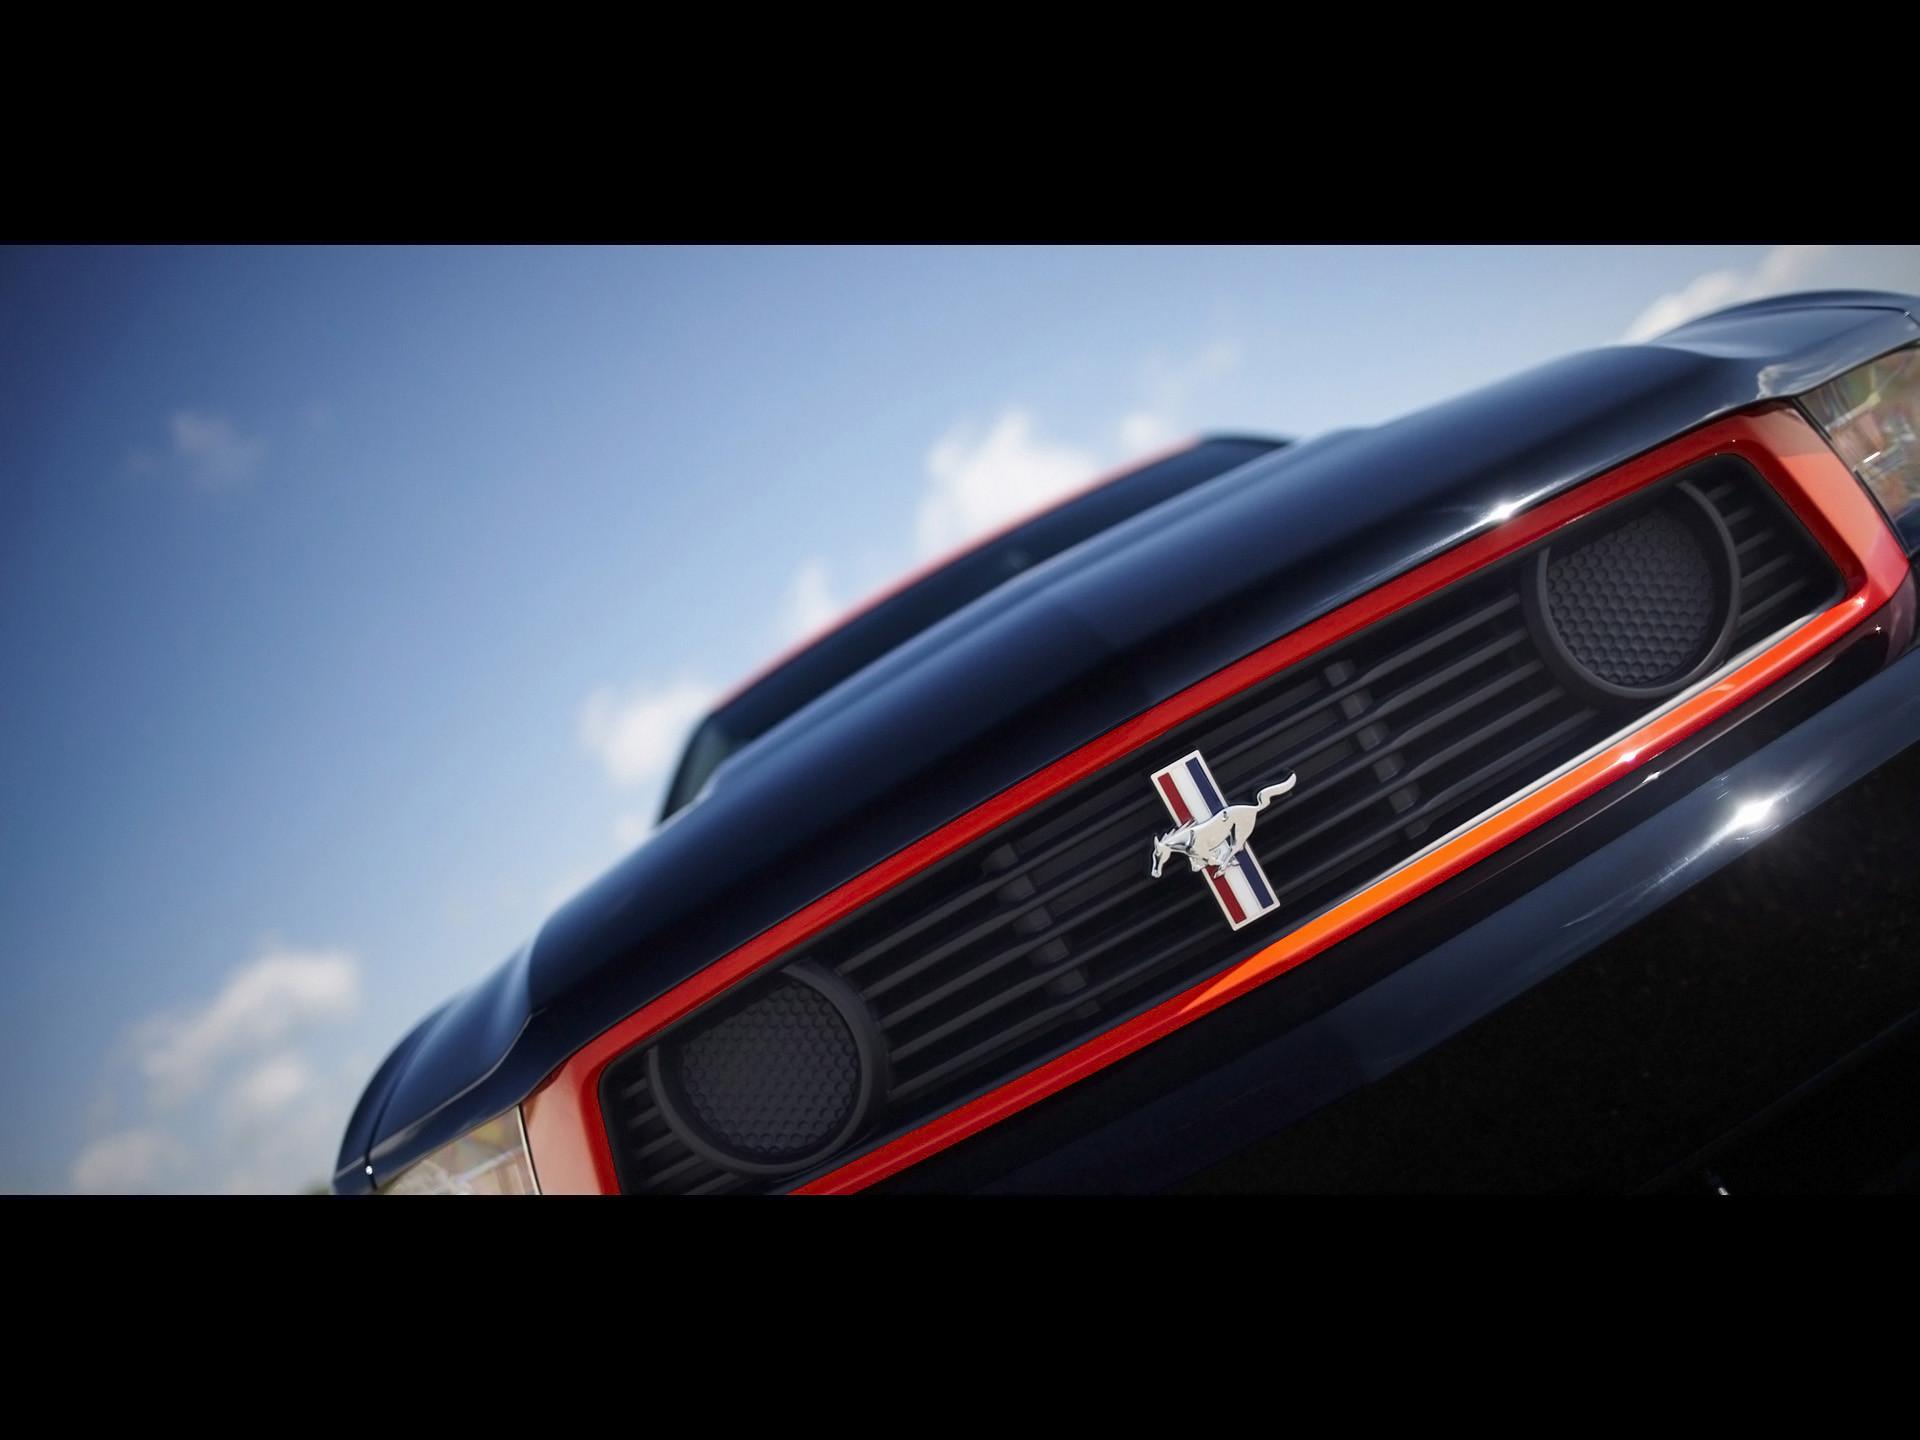 2012 Ford Mustang Boss 302 Laguna Seca – Front Grille Emblem – –  Wallpaper